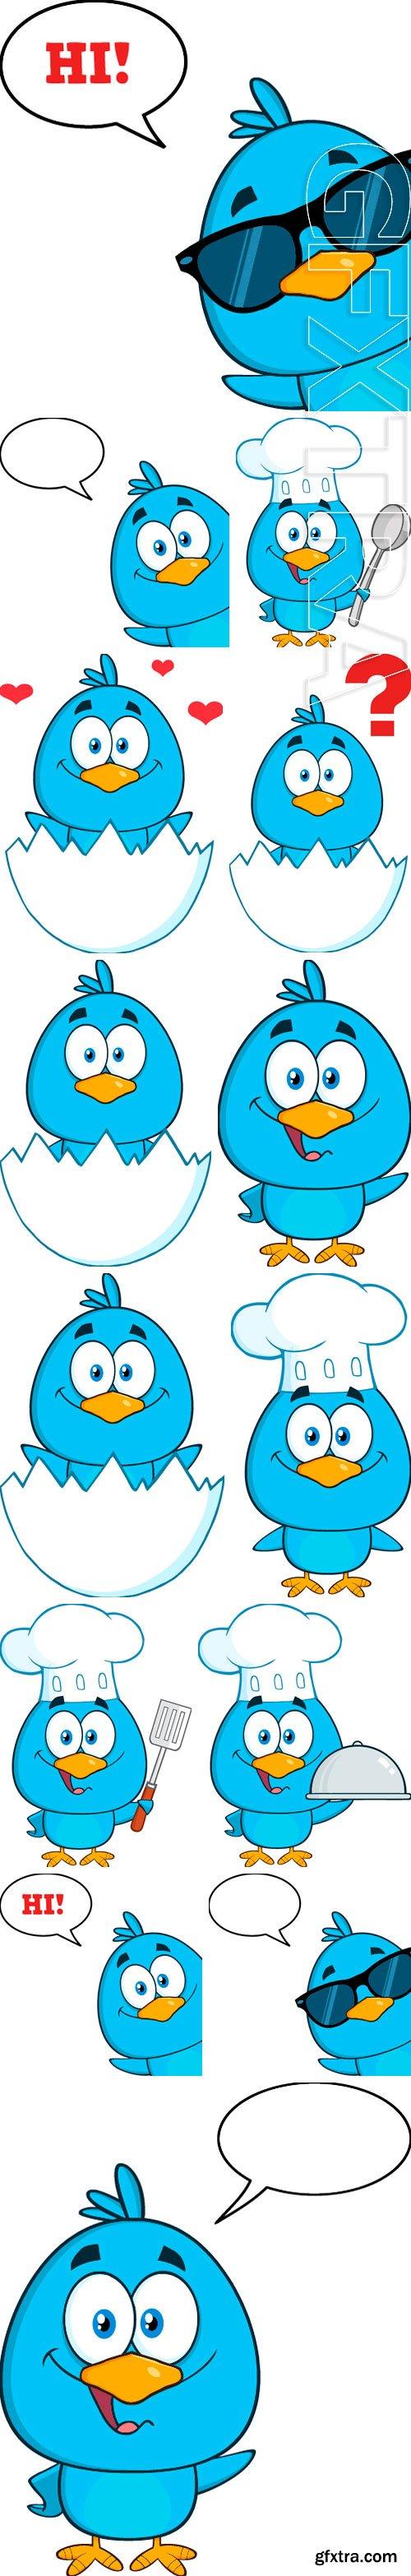 Stock Vectors - Cute Blue Bird Cartoon Character. Vector Illustration Isolated On White